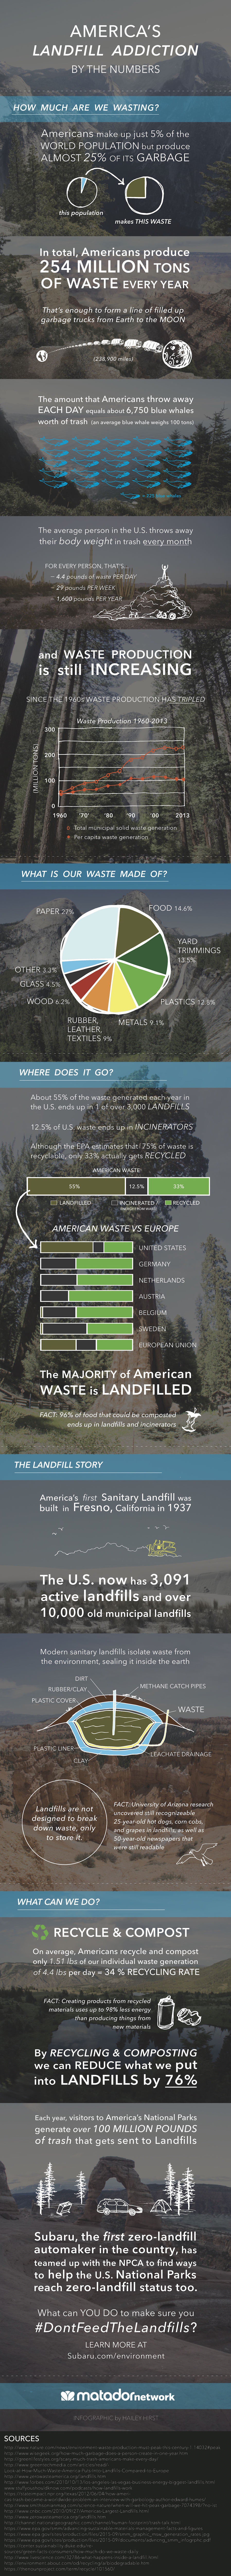 America's Landfill Addiction -   Subaru in partnership with Matador Network